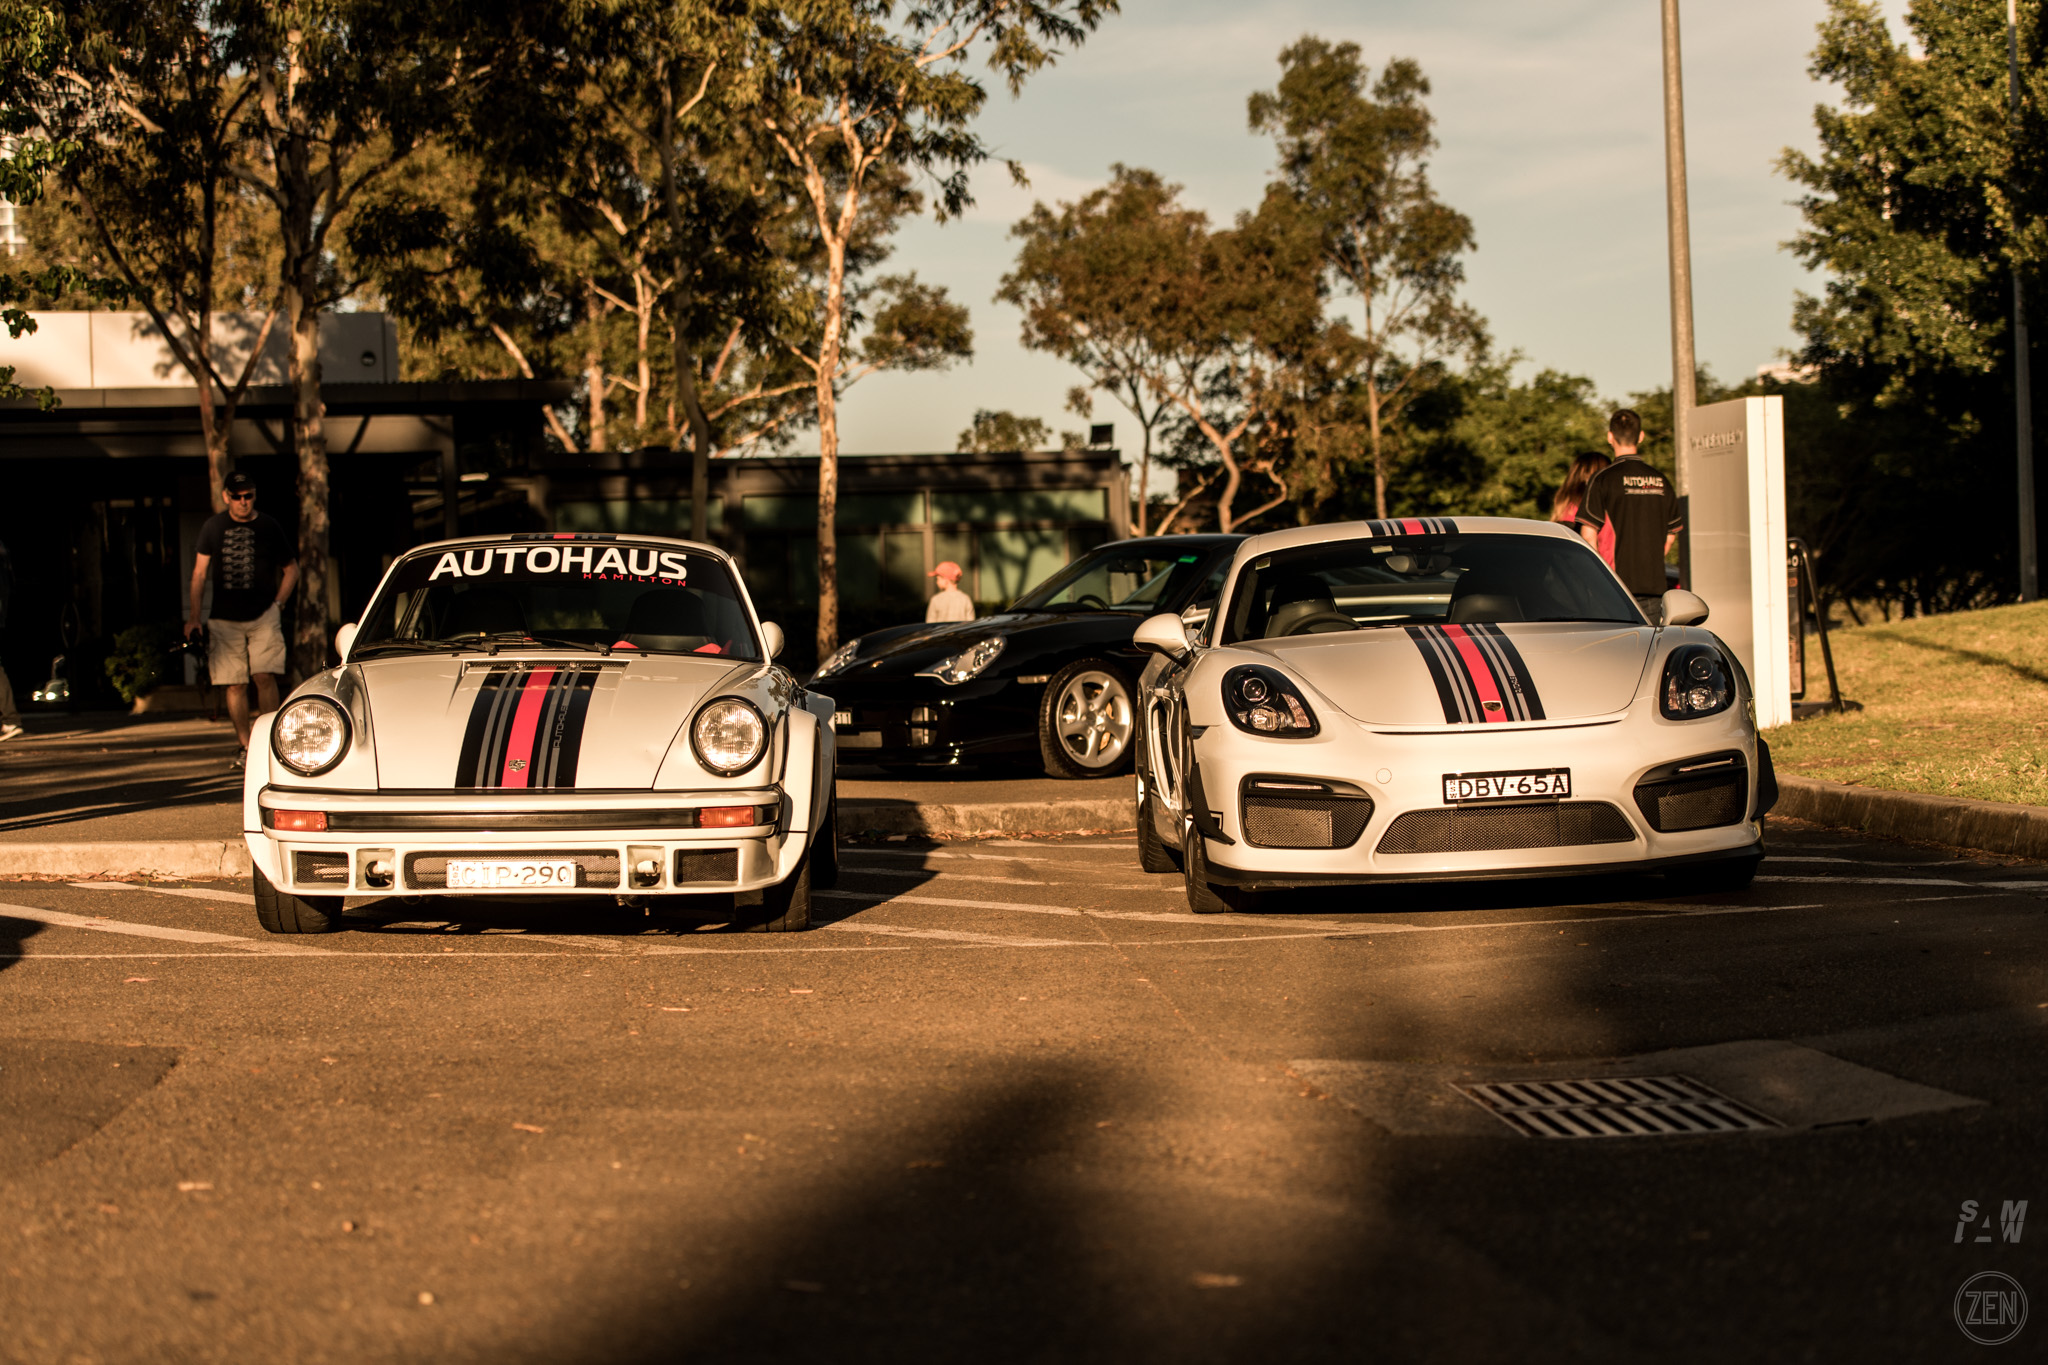 2019-10-27 - Autohaus Porsches & Coffee 051